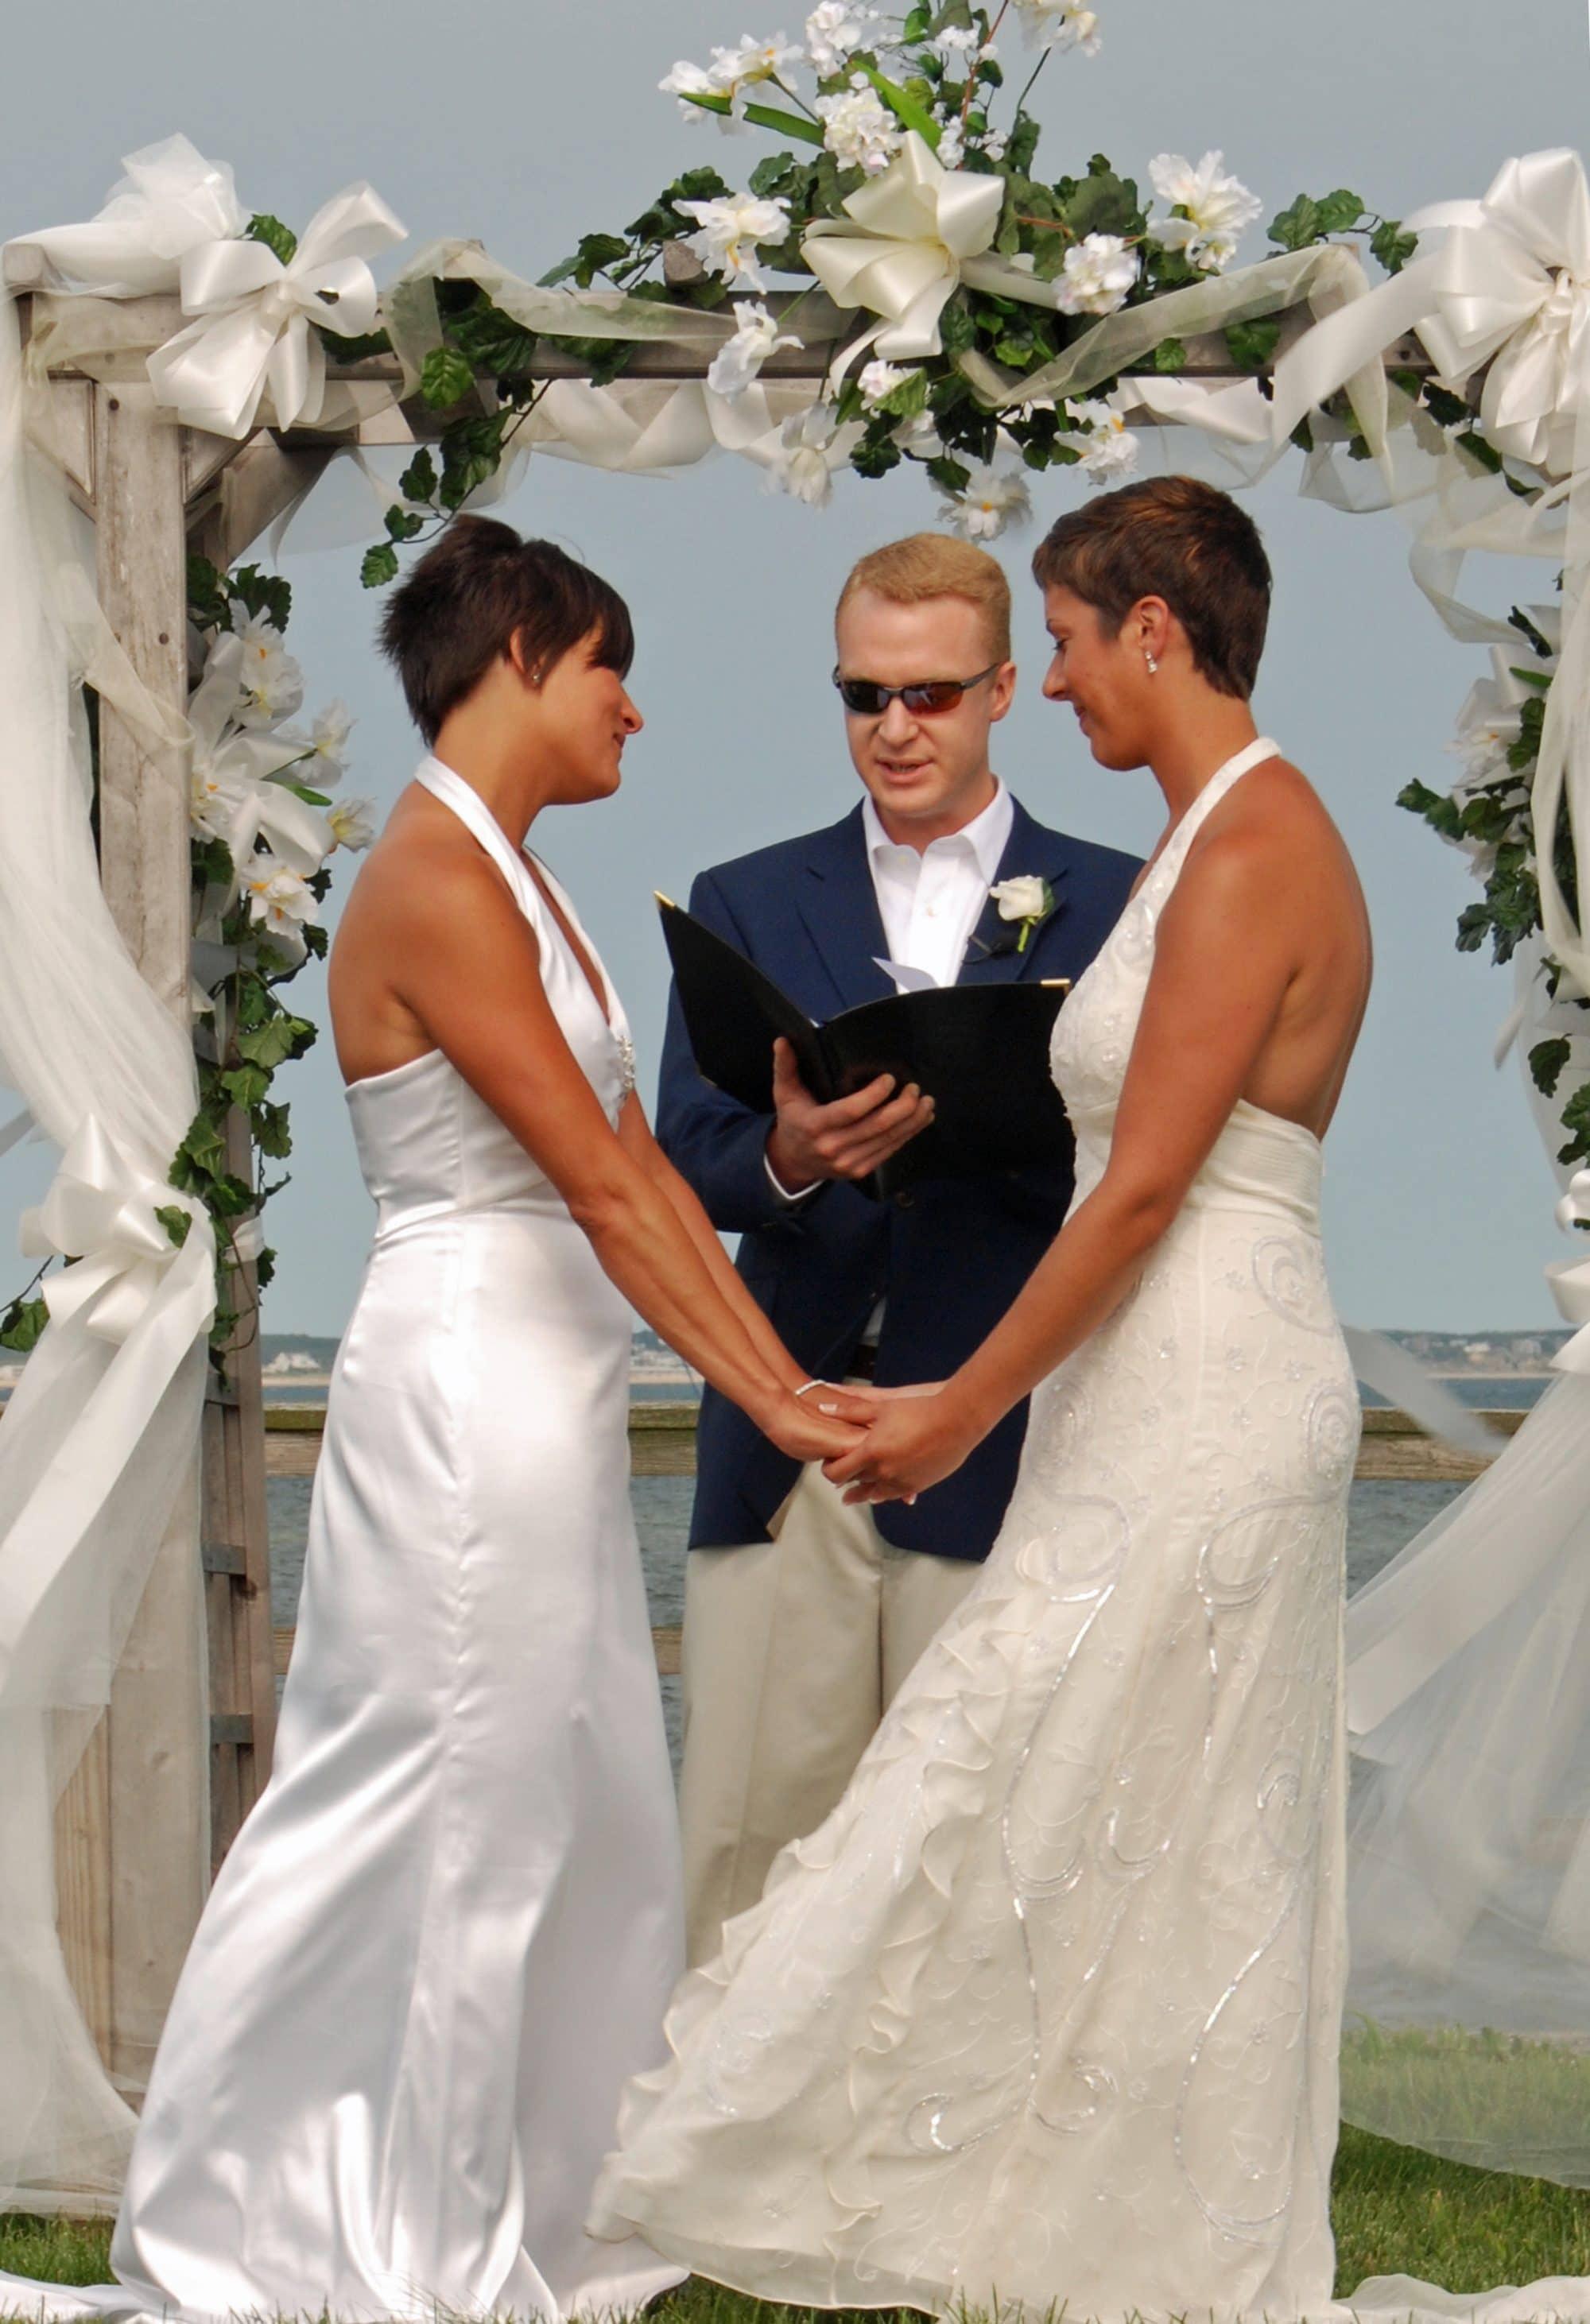 wedding pictures from kara k cd 1 083